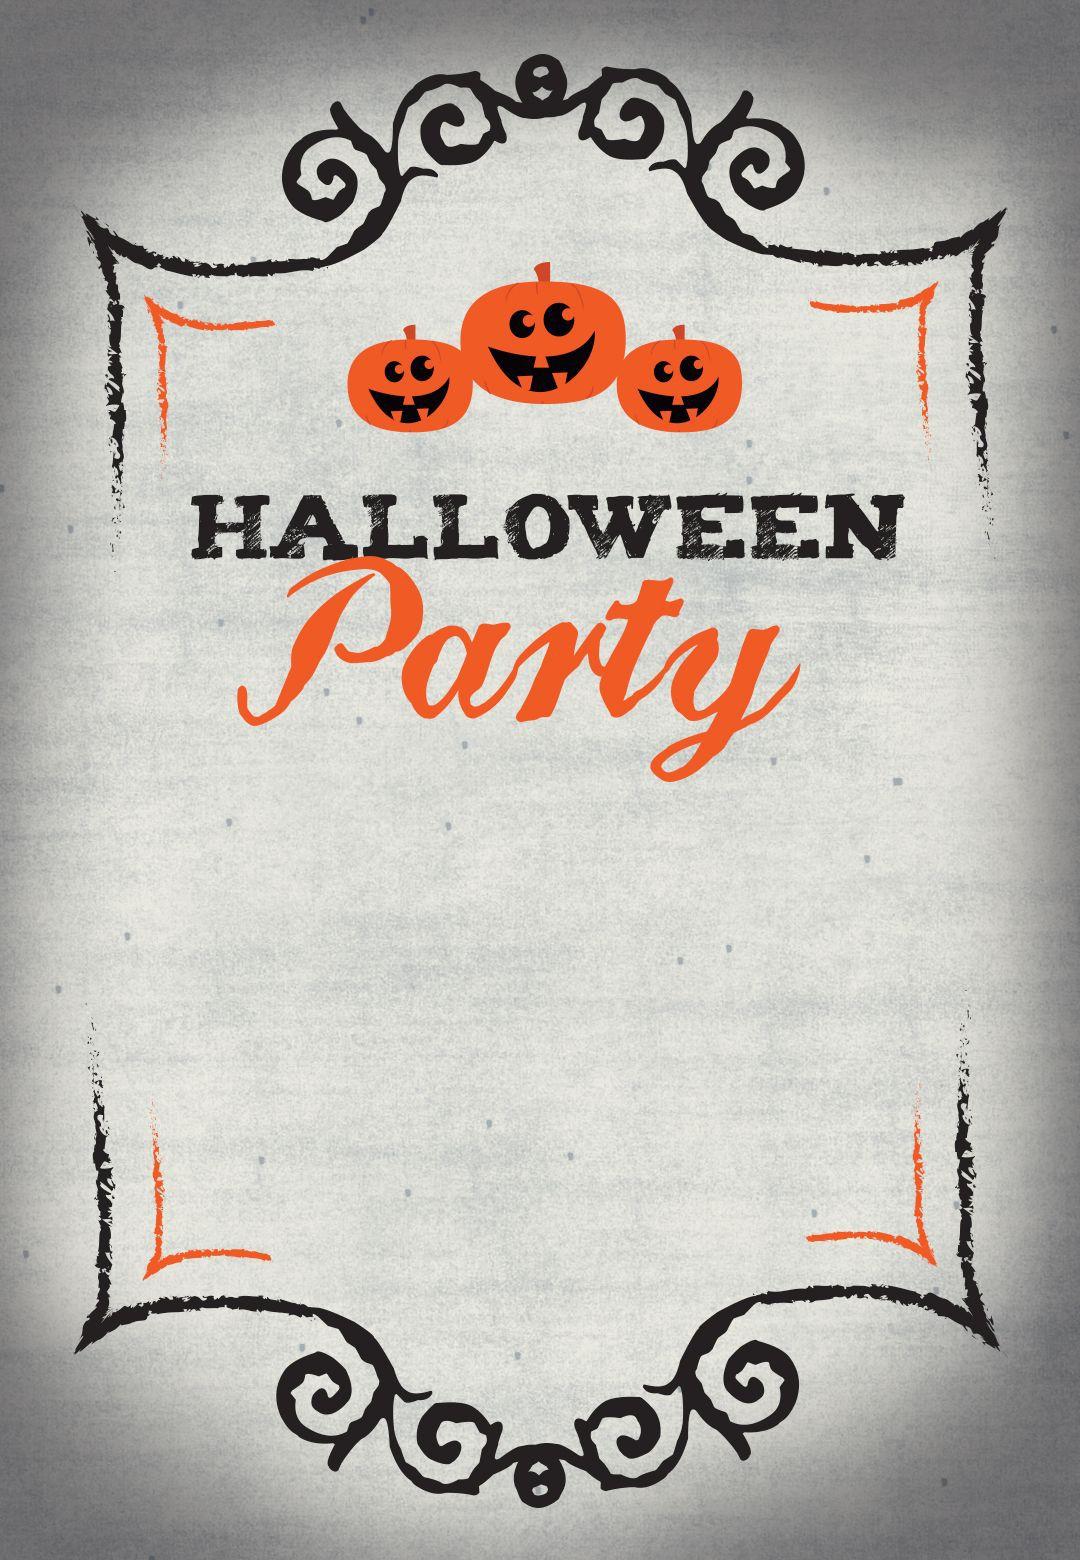 006 Outstanding Free Halloween Invitation Template Inspiration  Templates Online Printable Birthday Party WeddingFull